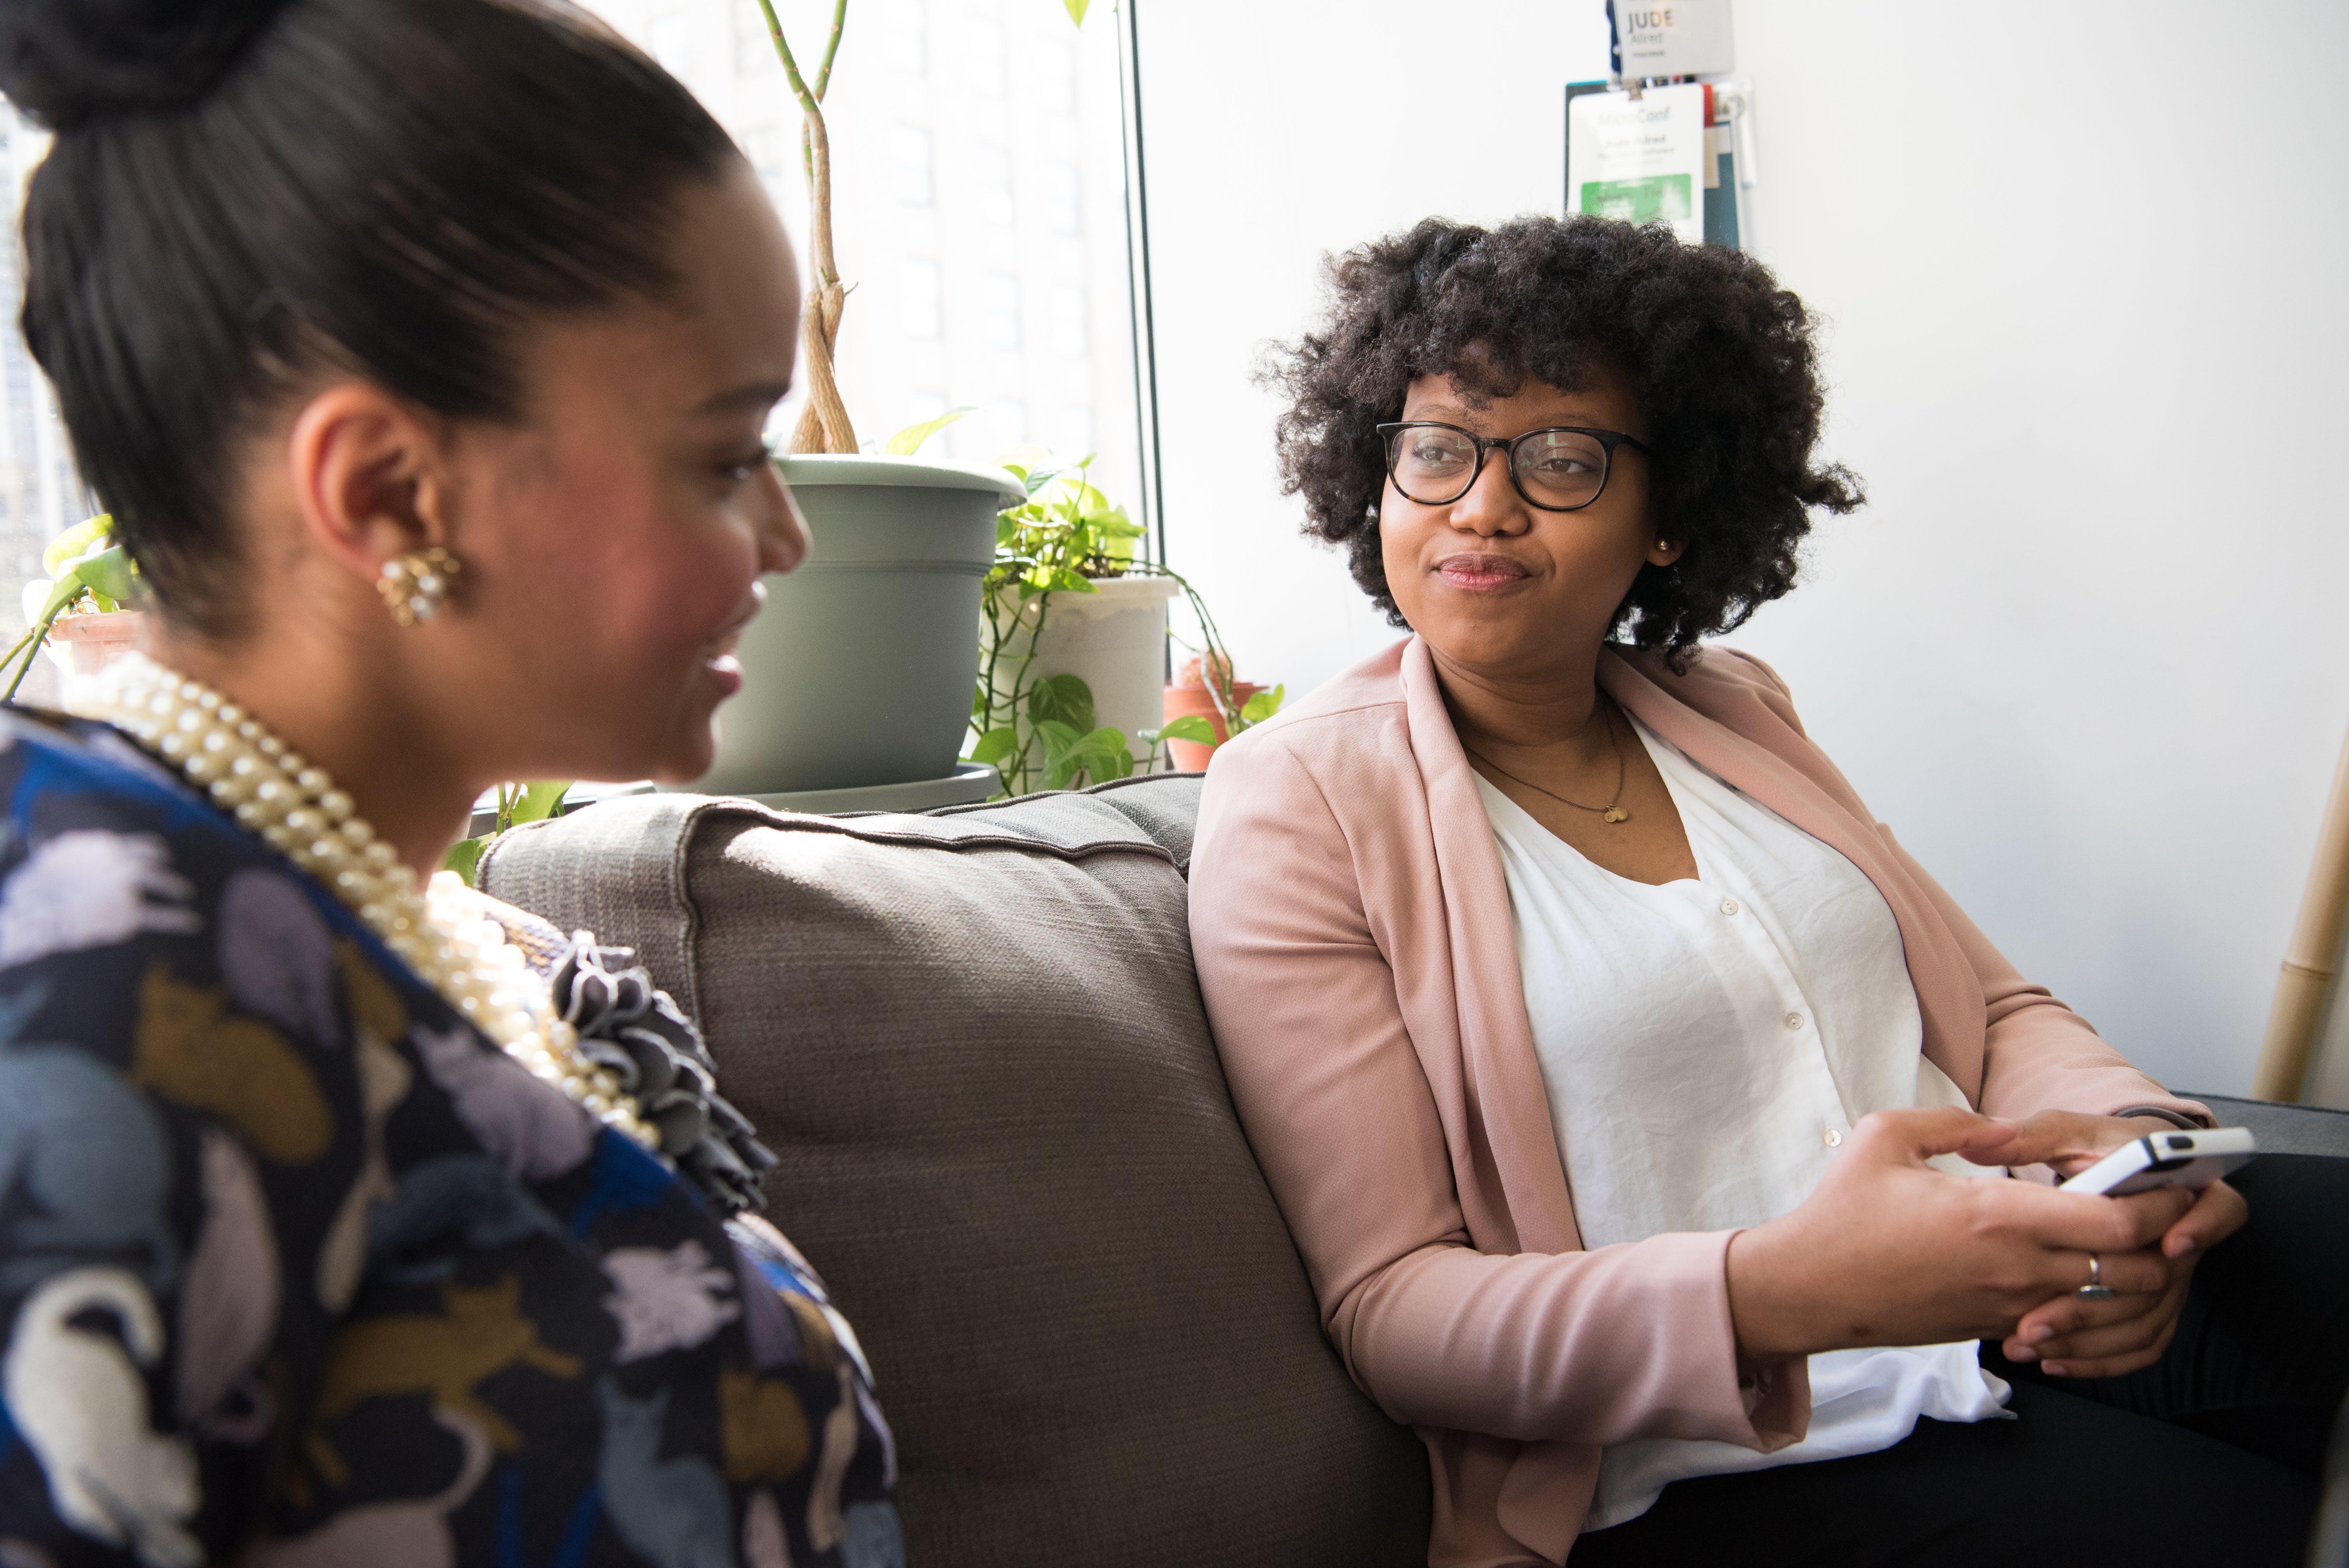 Two Women on Sofa Chatting